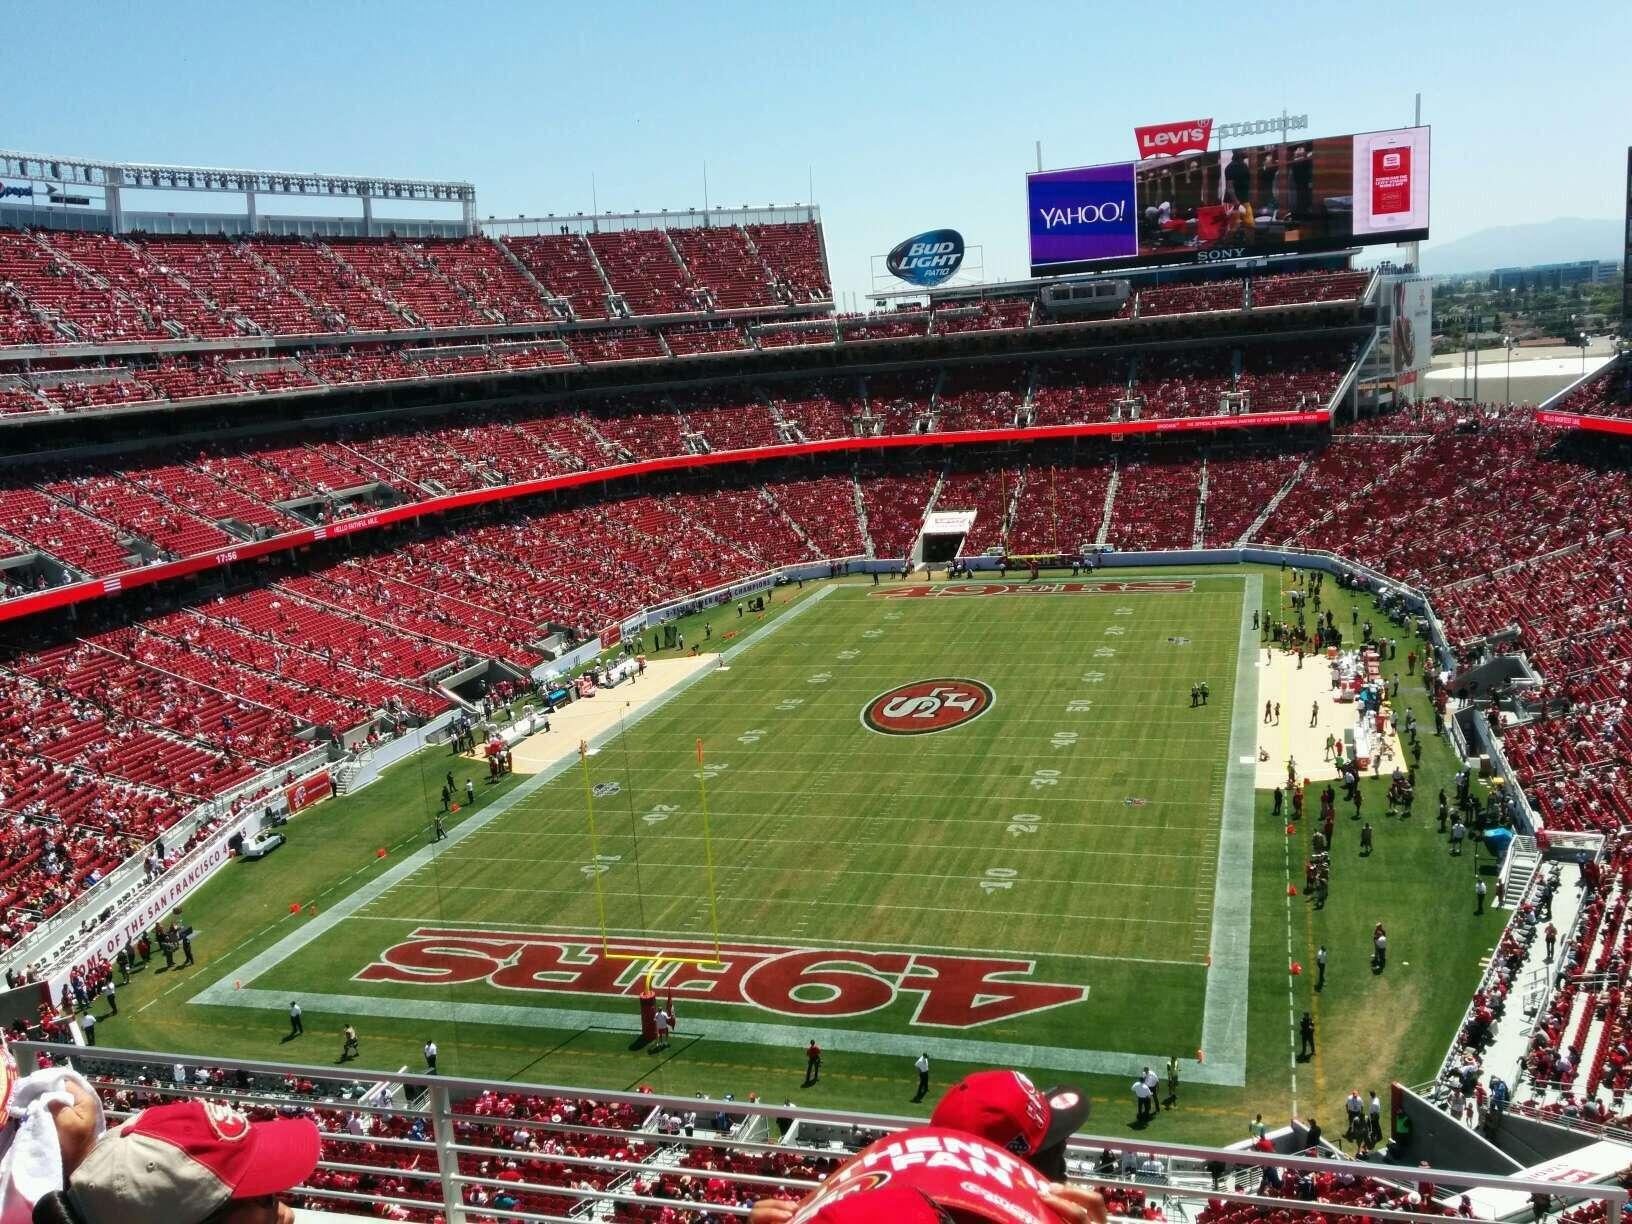 Levi S Stadium Section 301 Row 4 Seat 36 San Francisco